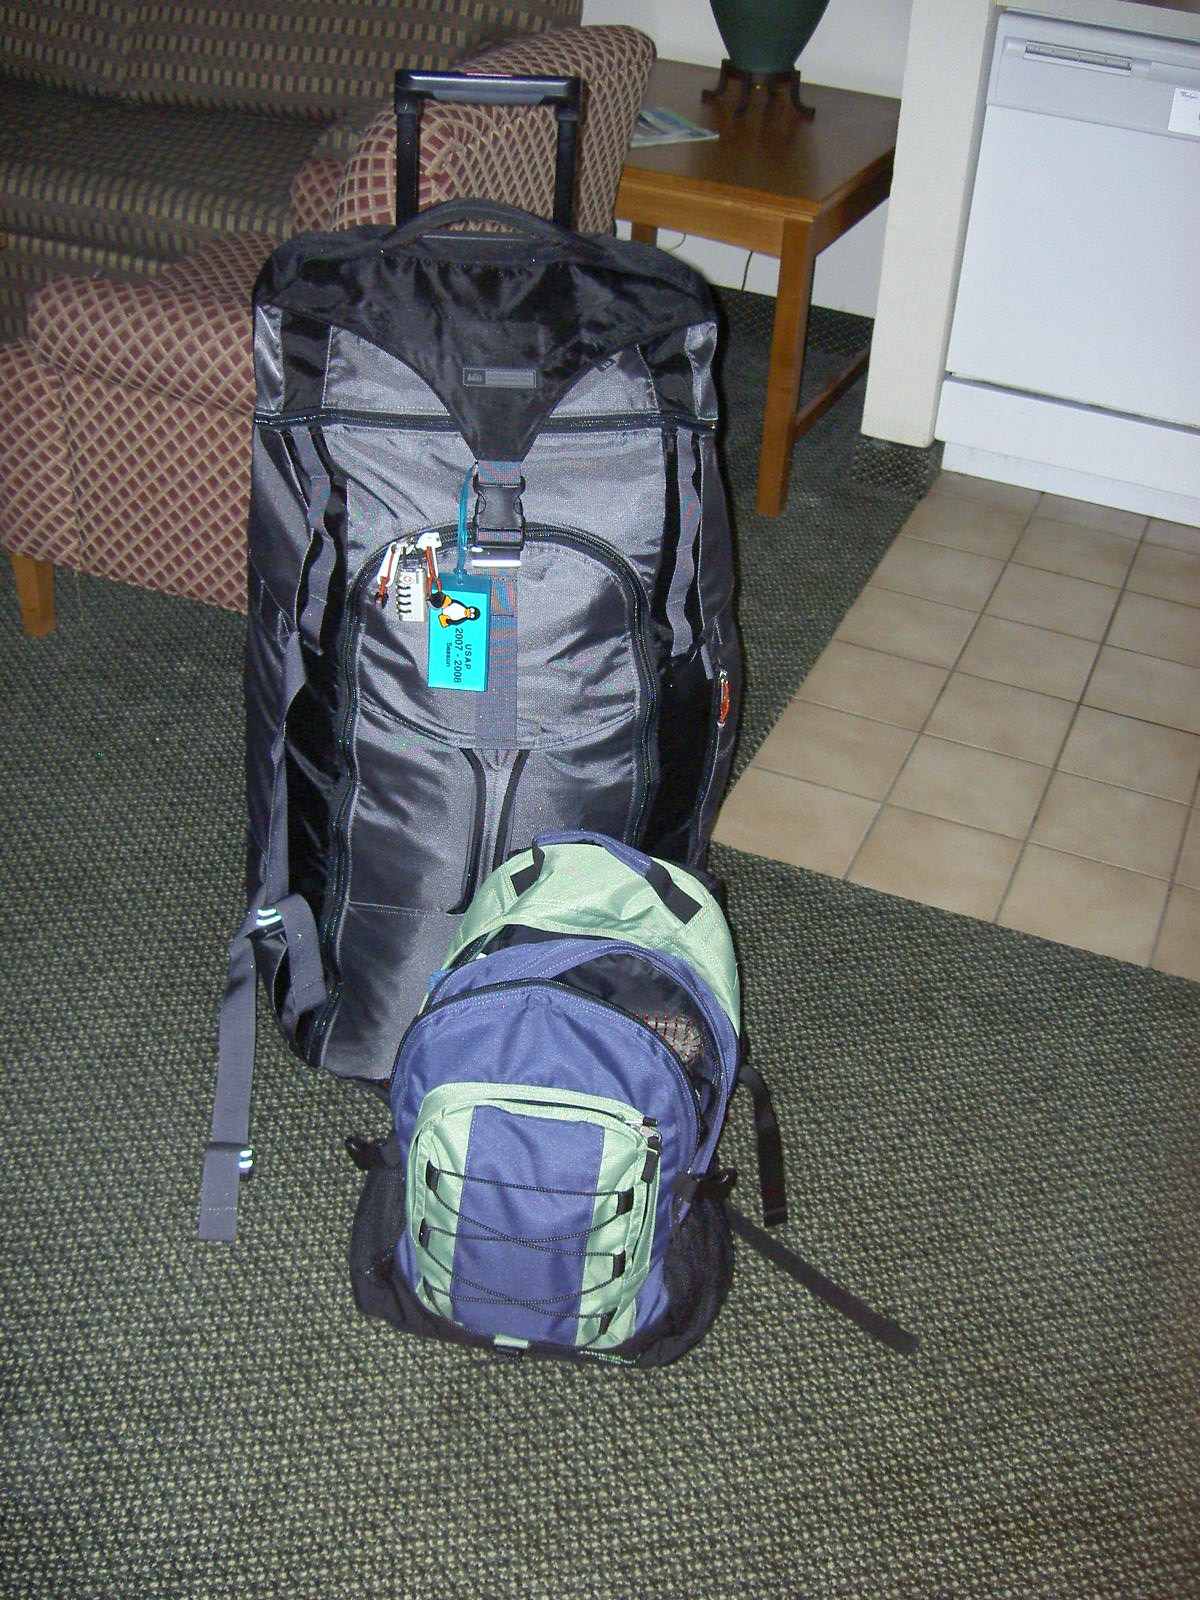 bag-001.JPG